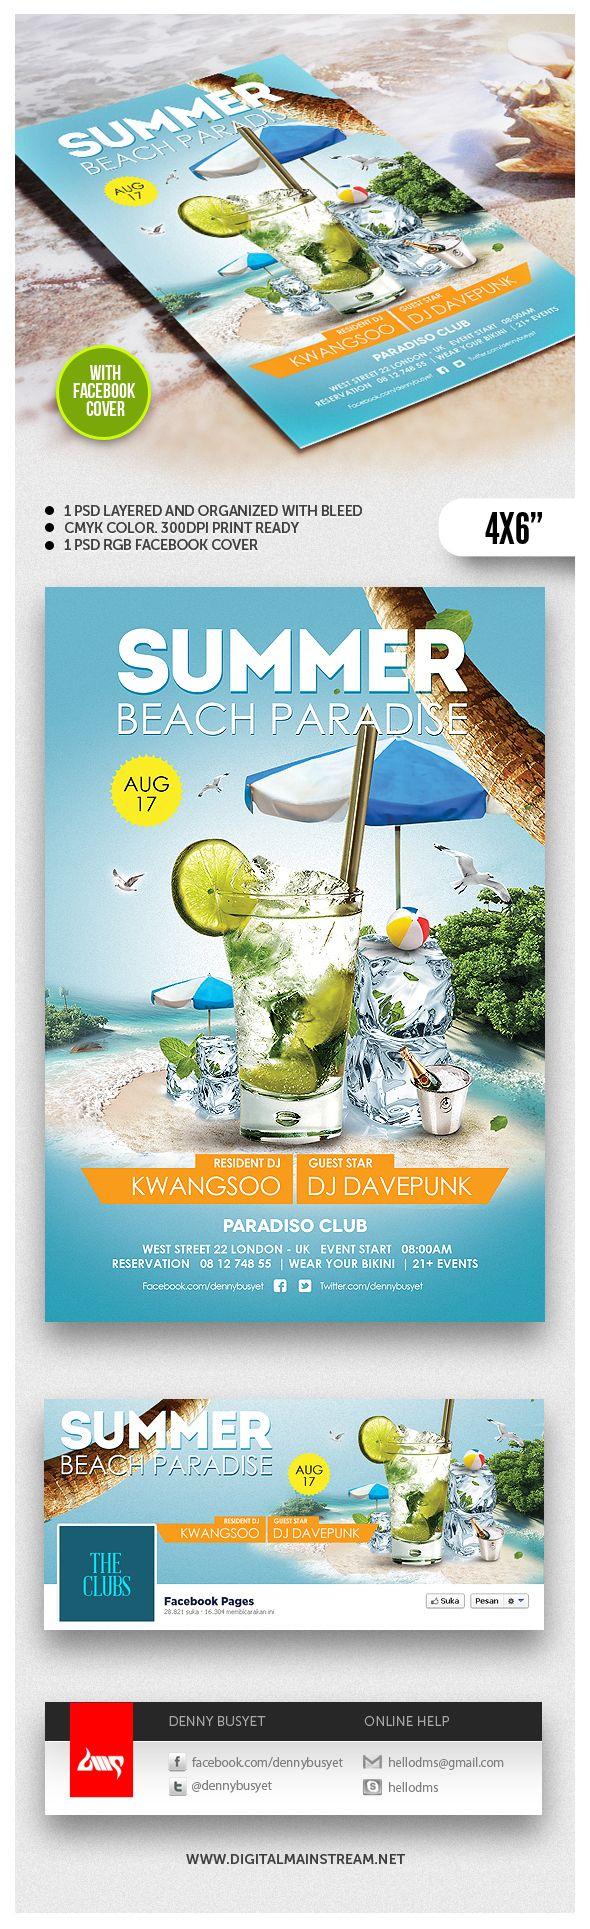 Summer Beach Paradise Flyer Template by Denny Budi Susetyo, via Behance